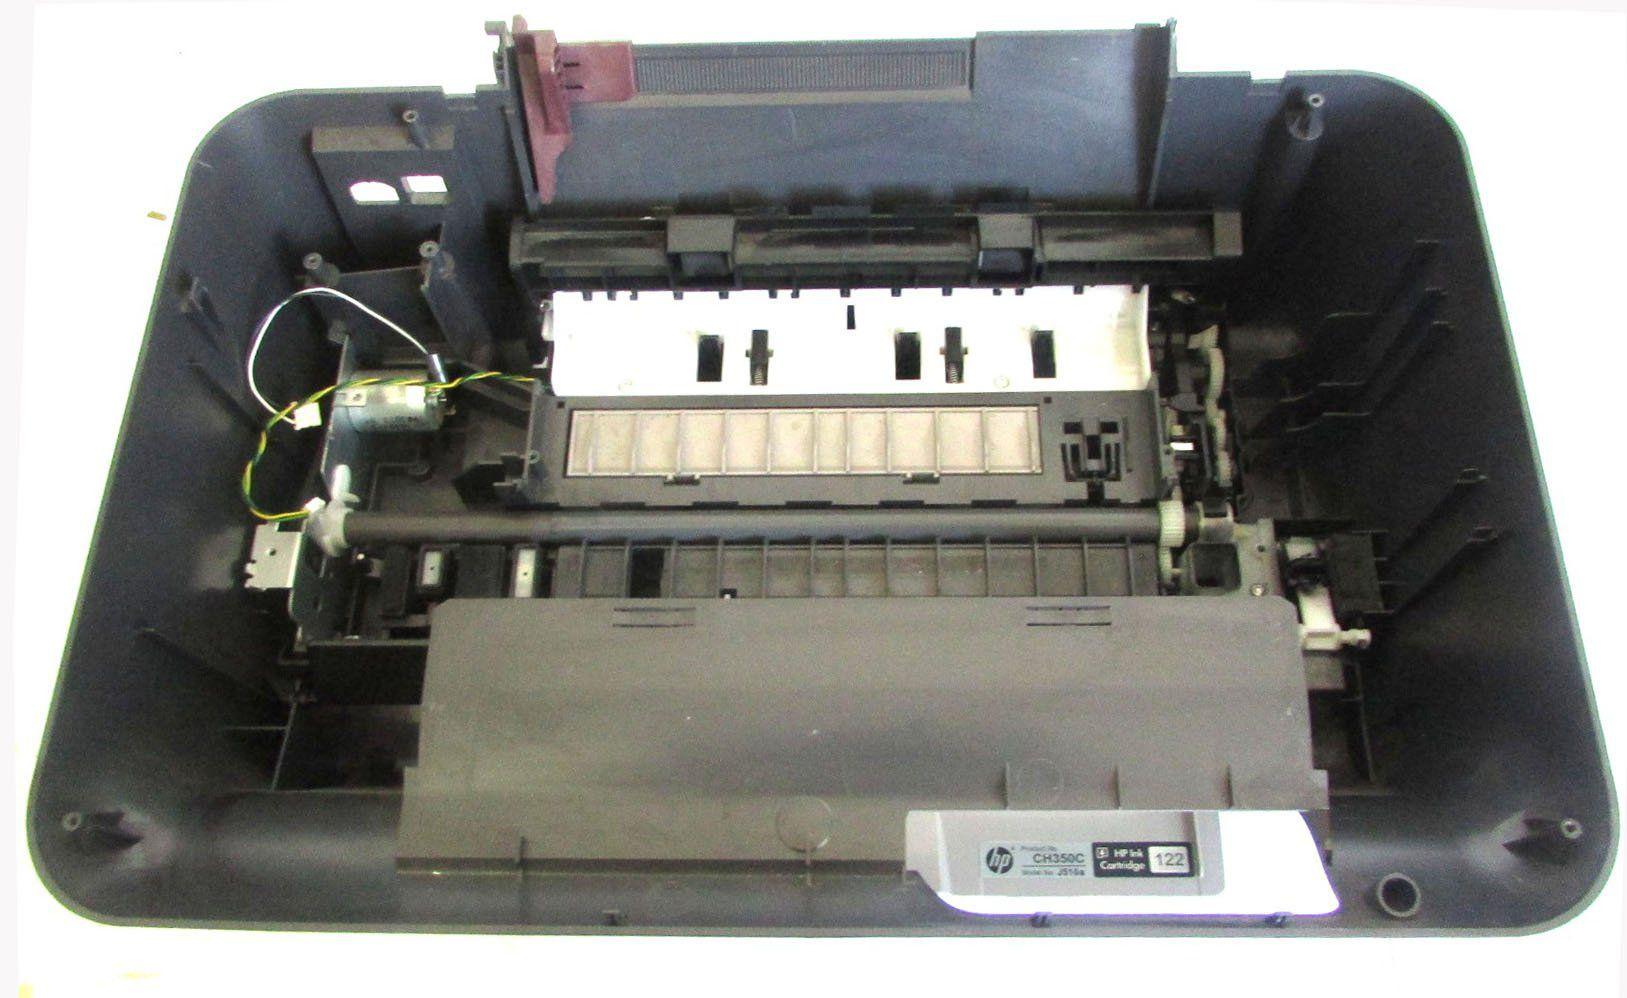 Mecanismo Completo c/ Carcaça Impressora HP 2050 J510a (semi novo)